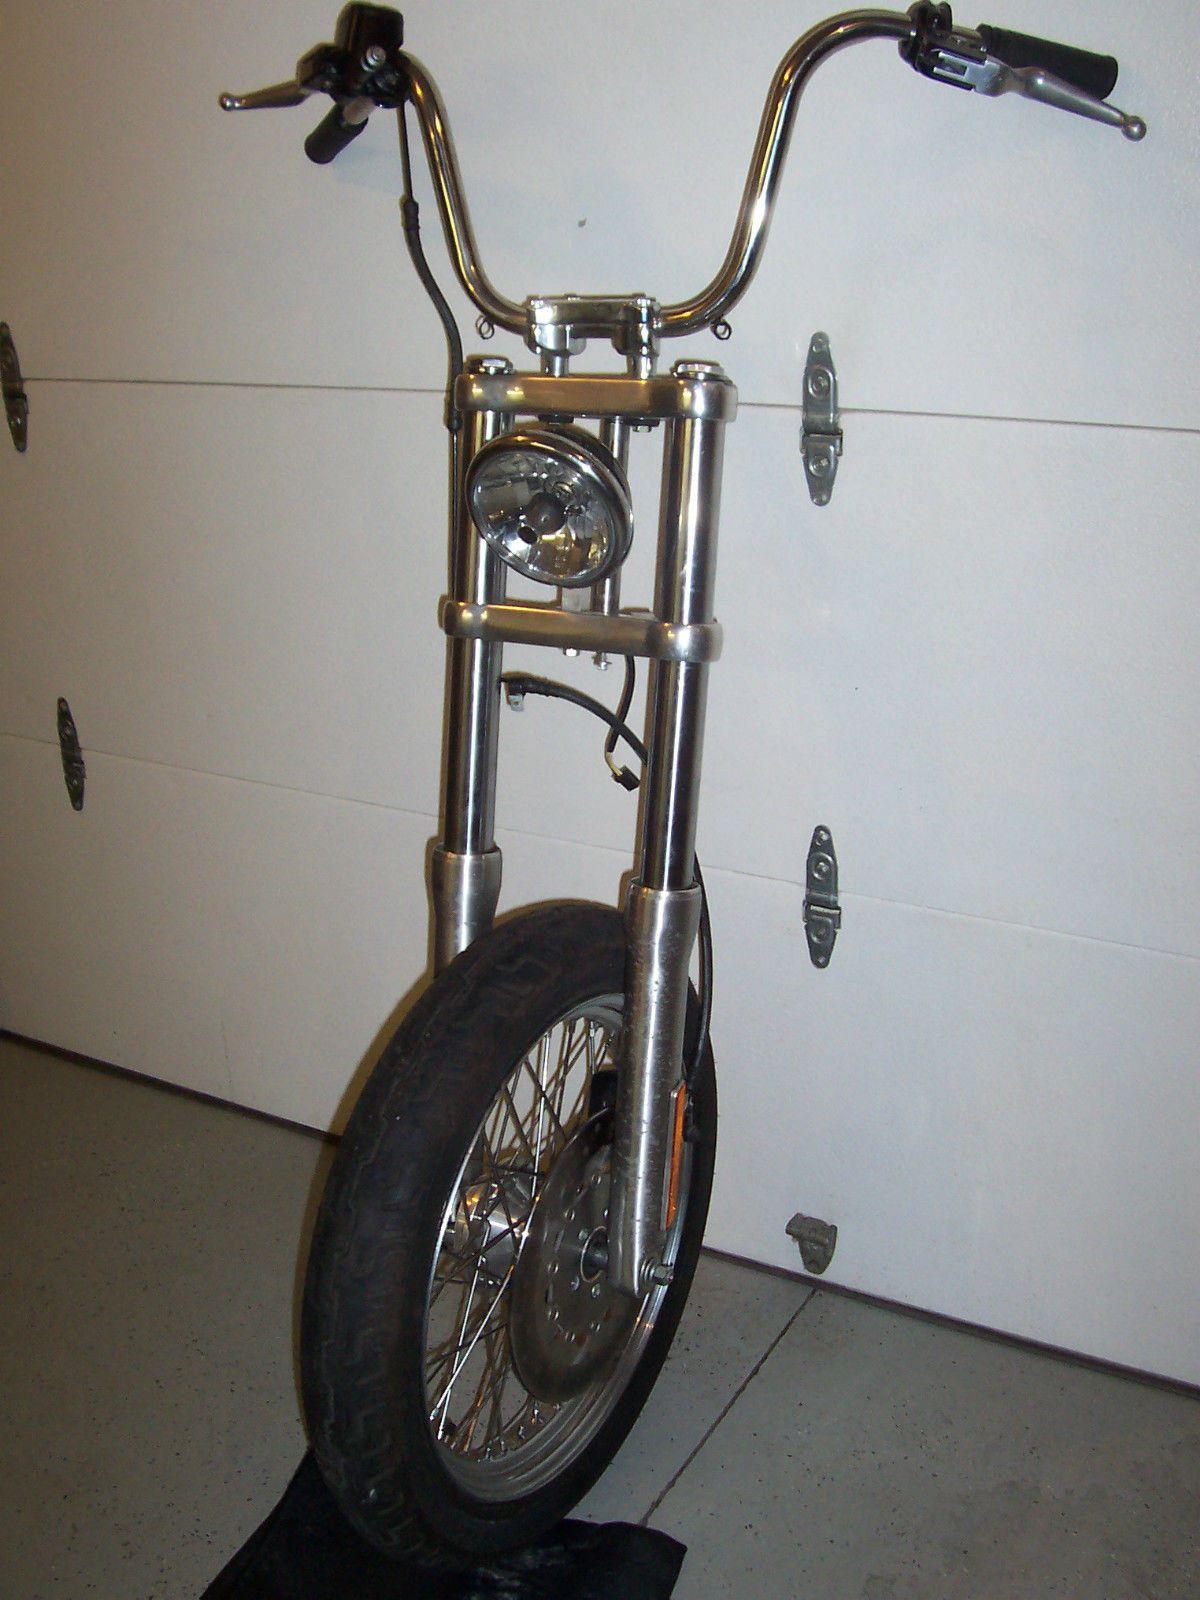 harley dyna street bob super glide front end assembly 2007 49mm